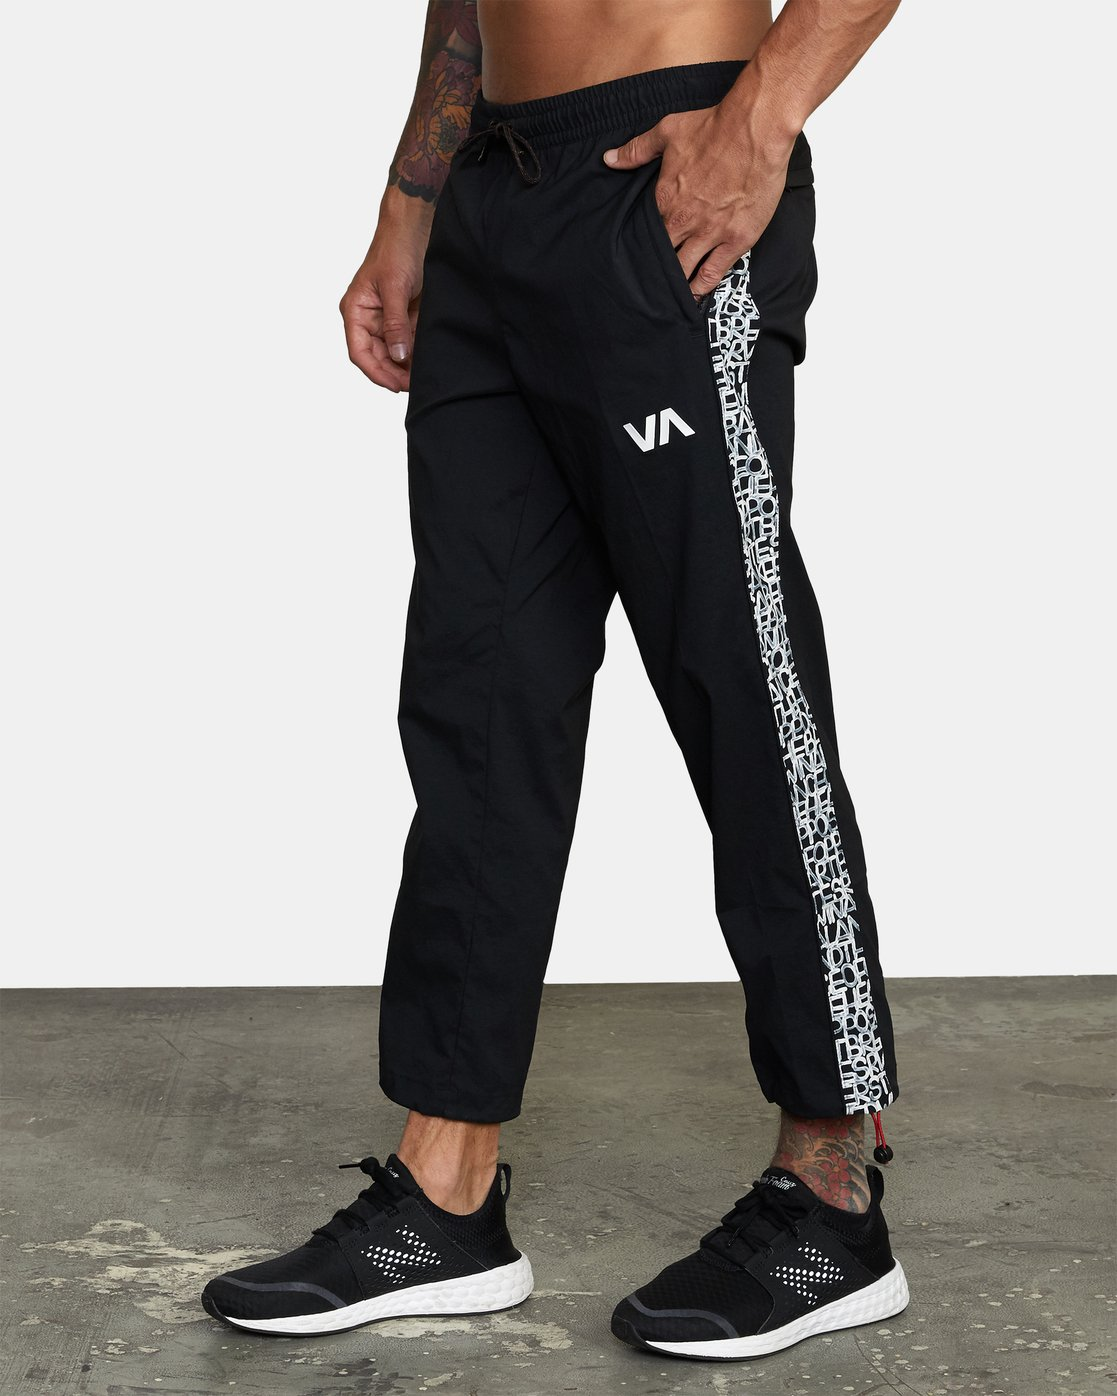 2 Bedwin IPFU - Joggers for Men Black W4PTMGRVP1 RVCA